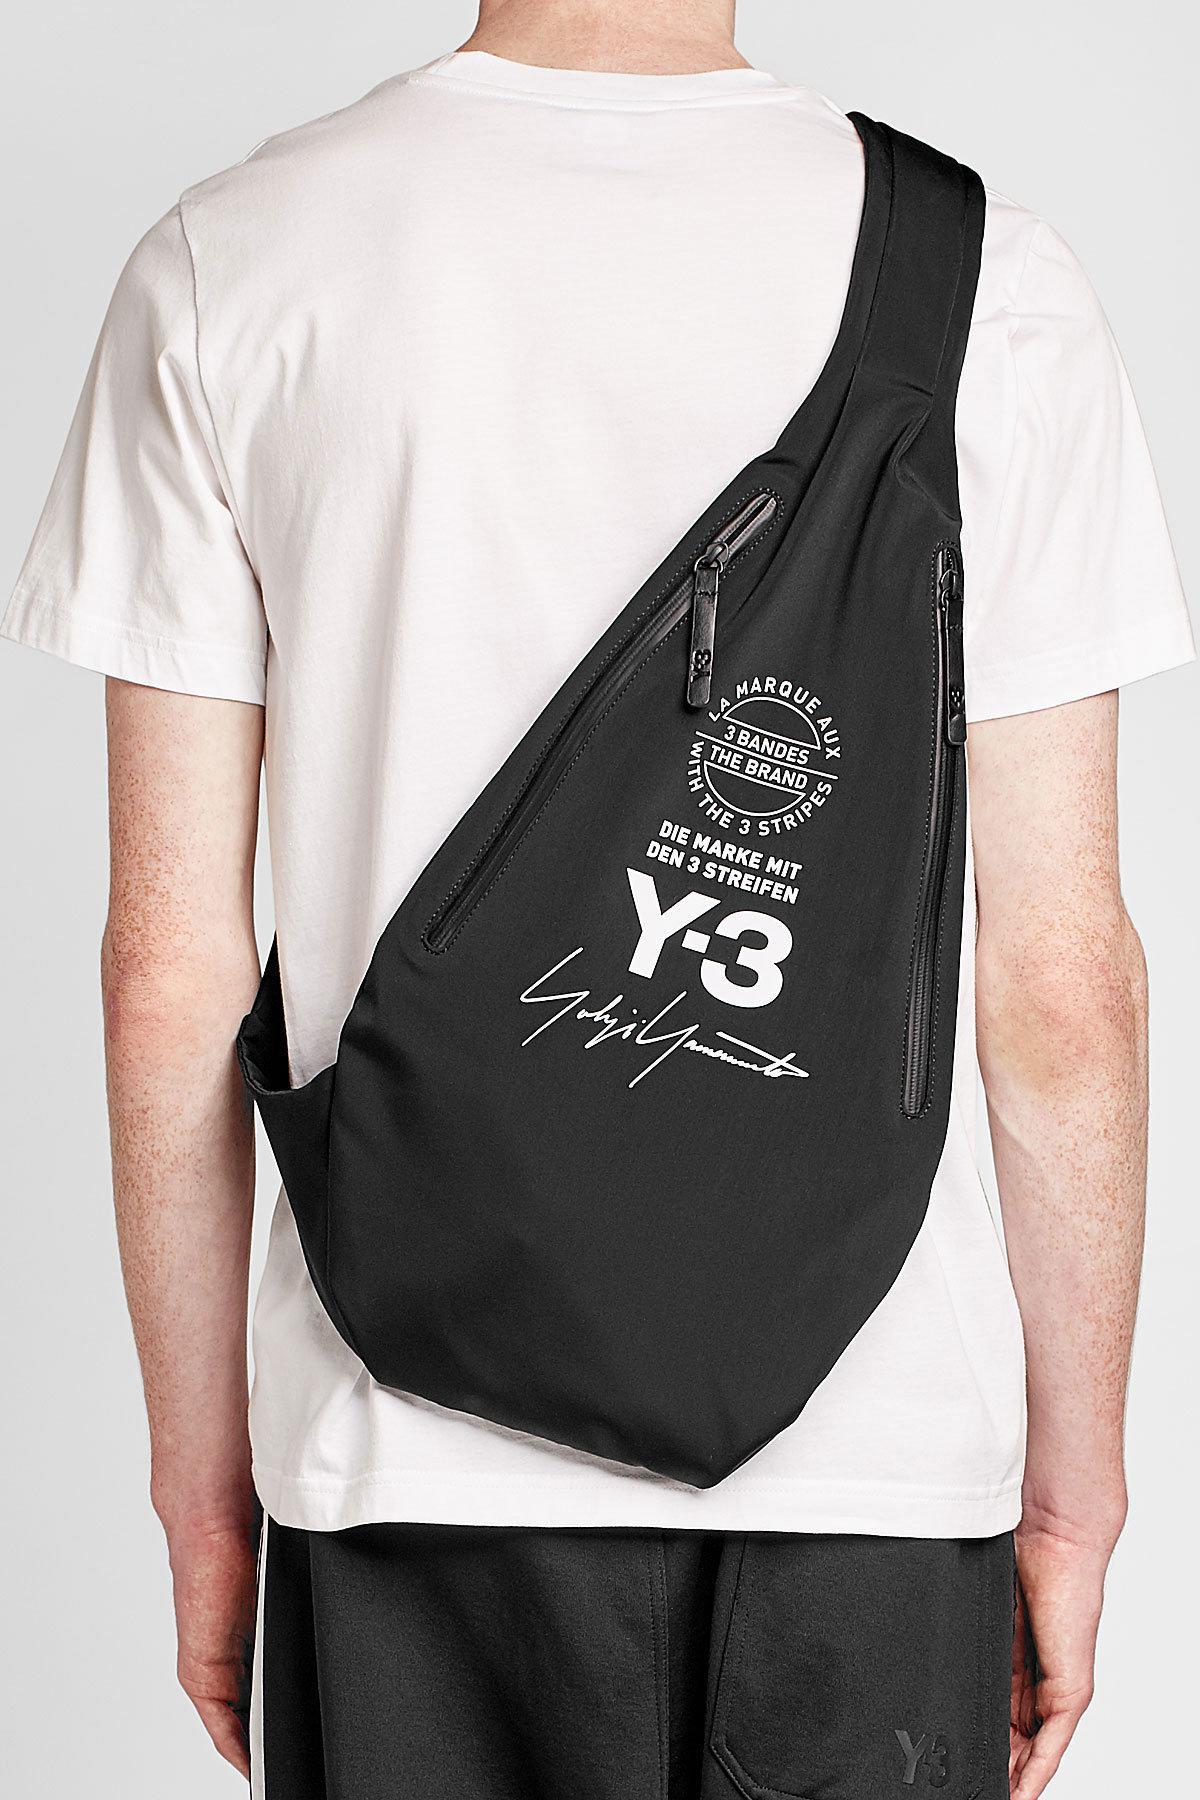 Lyst - Y-3 Fabric Messenger Bag in Black for Men b57288133b4cc